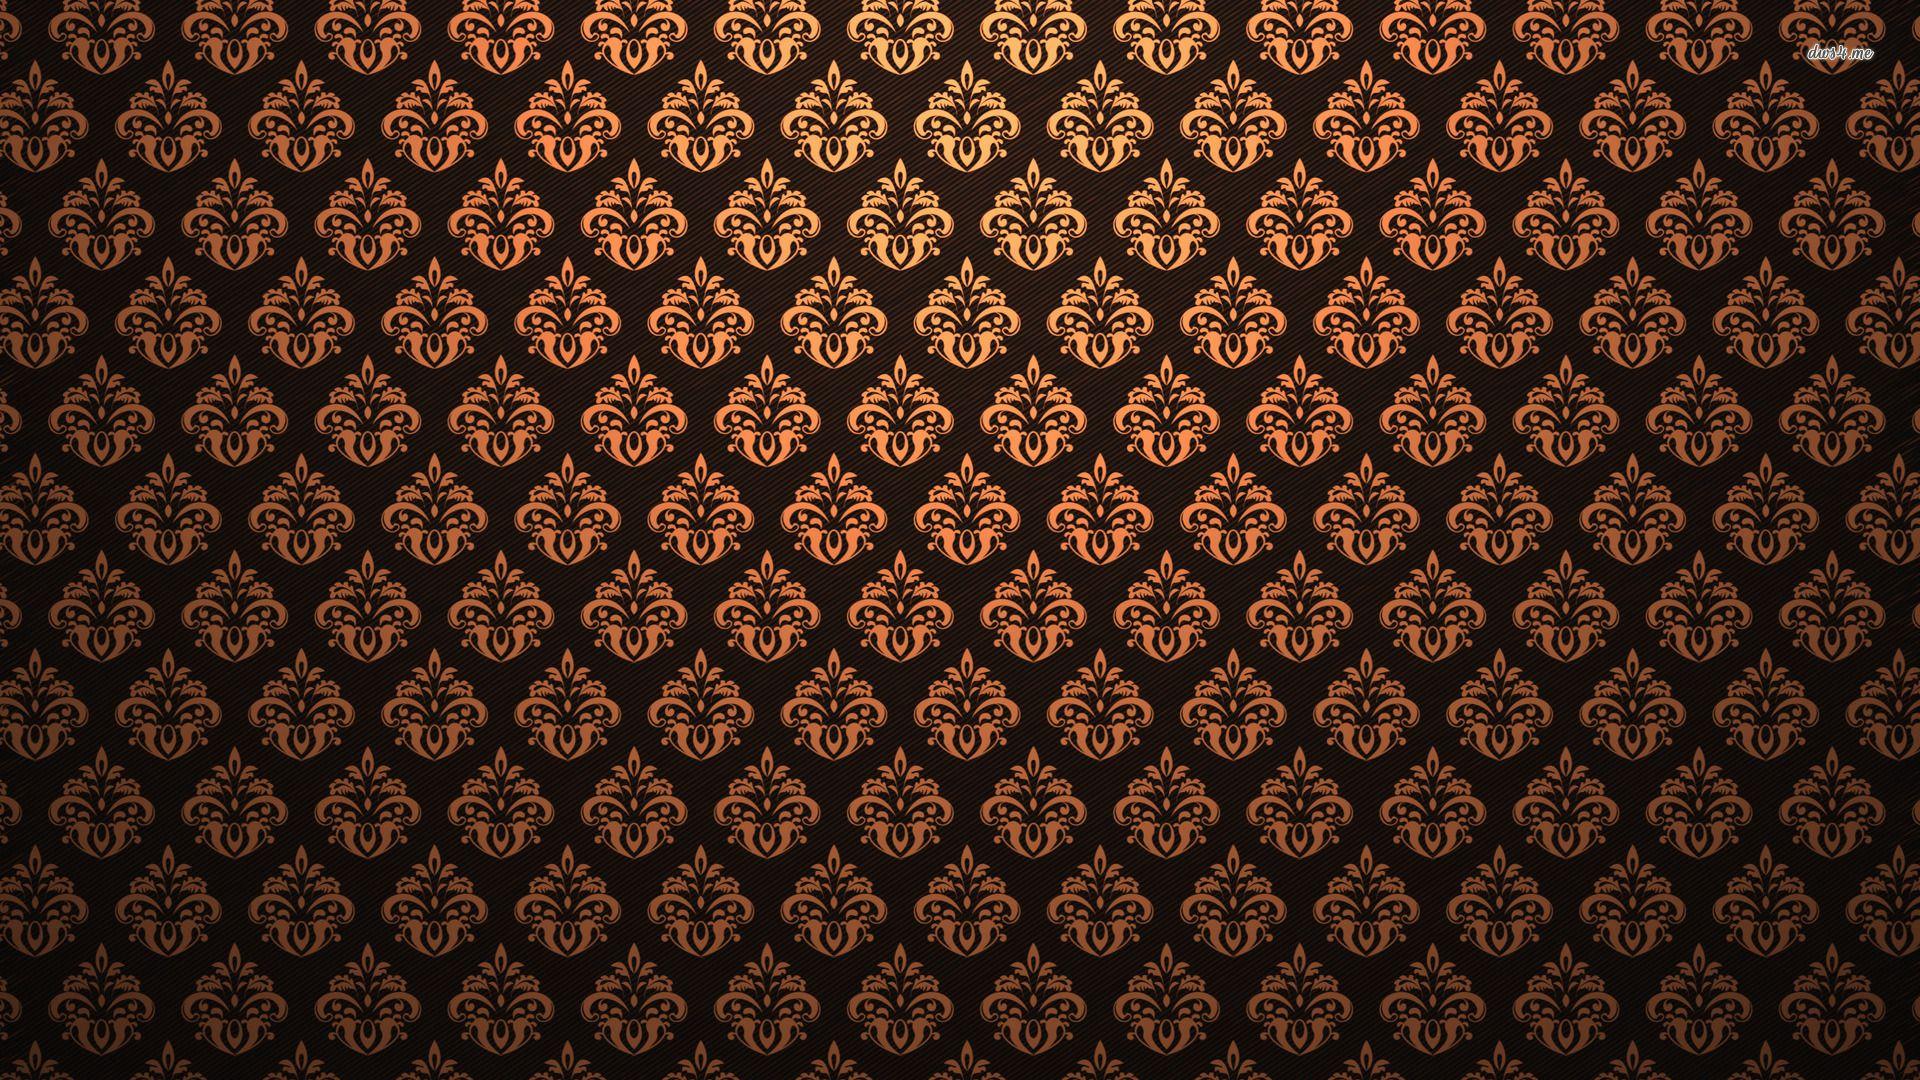 Seamless Vintage Pattern Wallpaper Images 1h1 1920x1080